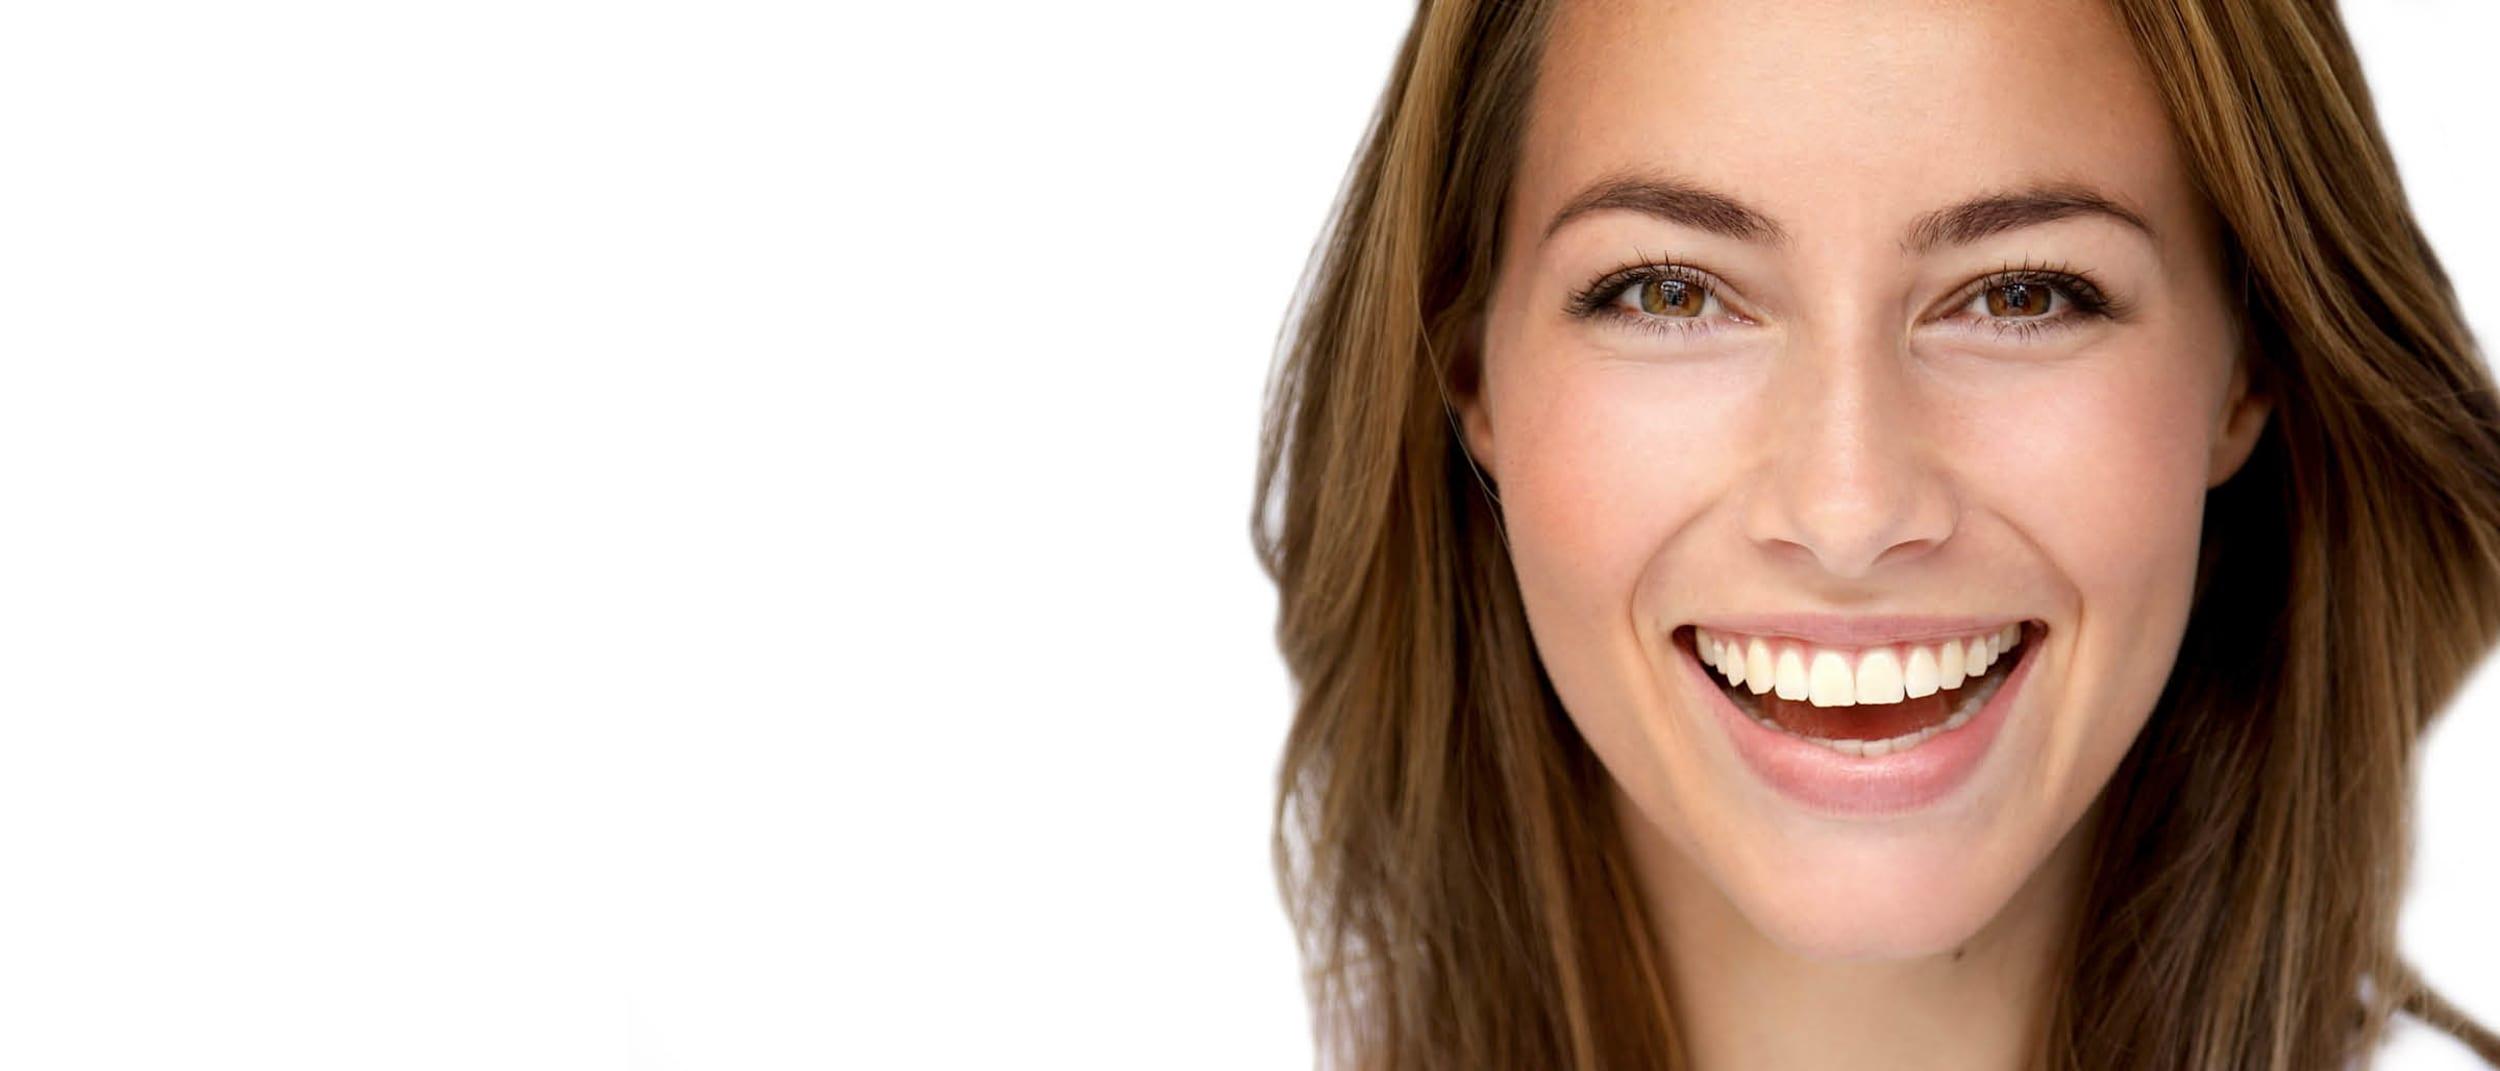 Clear Skincare Clinics: Dermapen skin needling treatment for $149